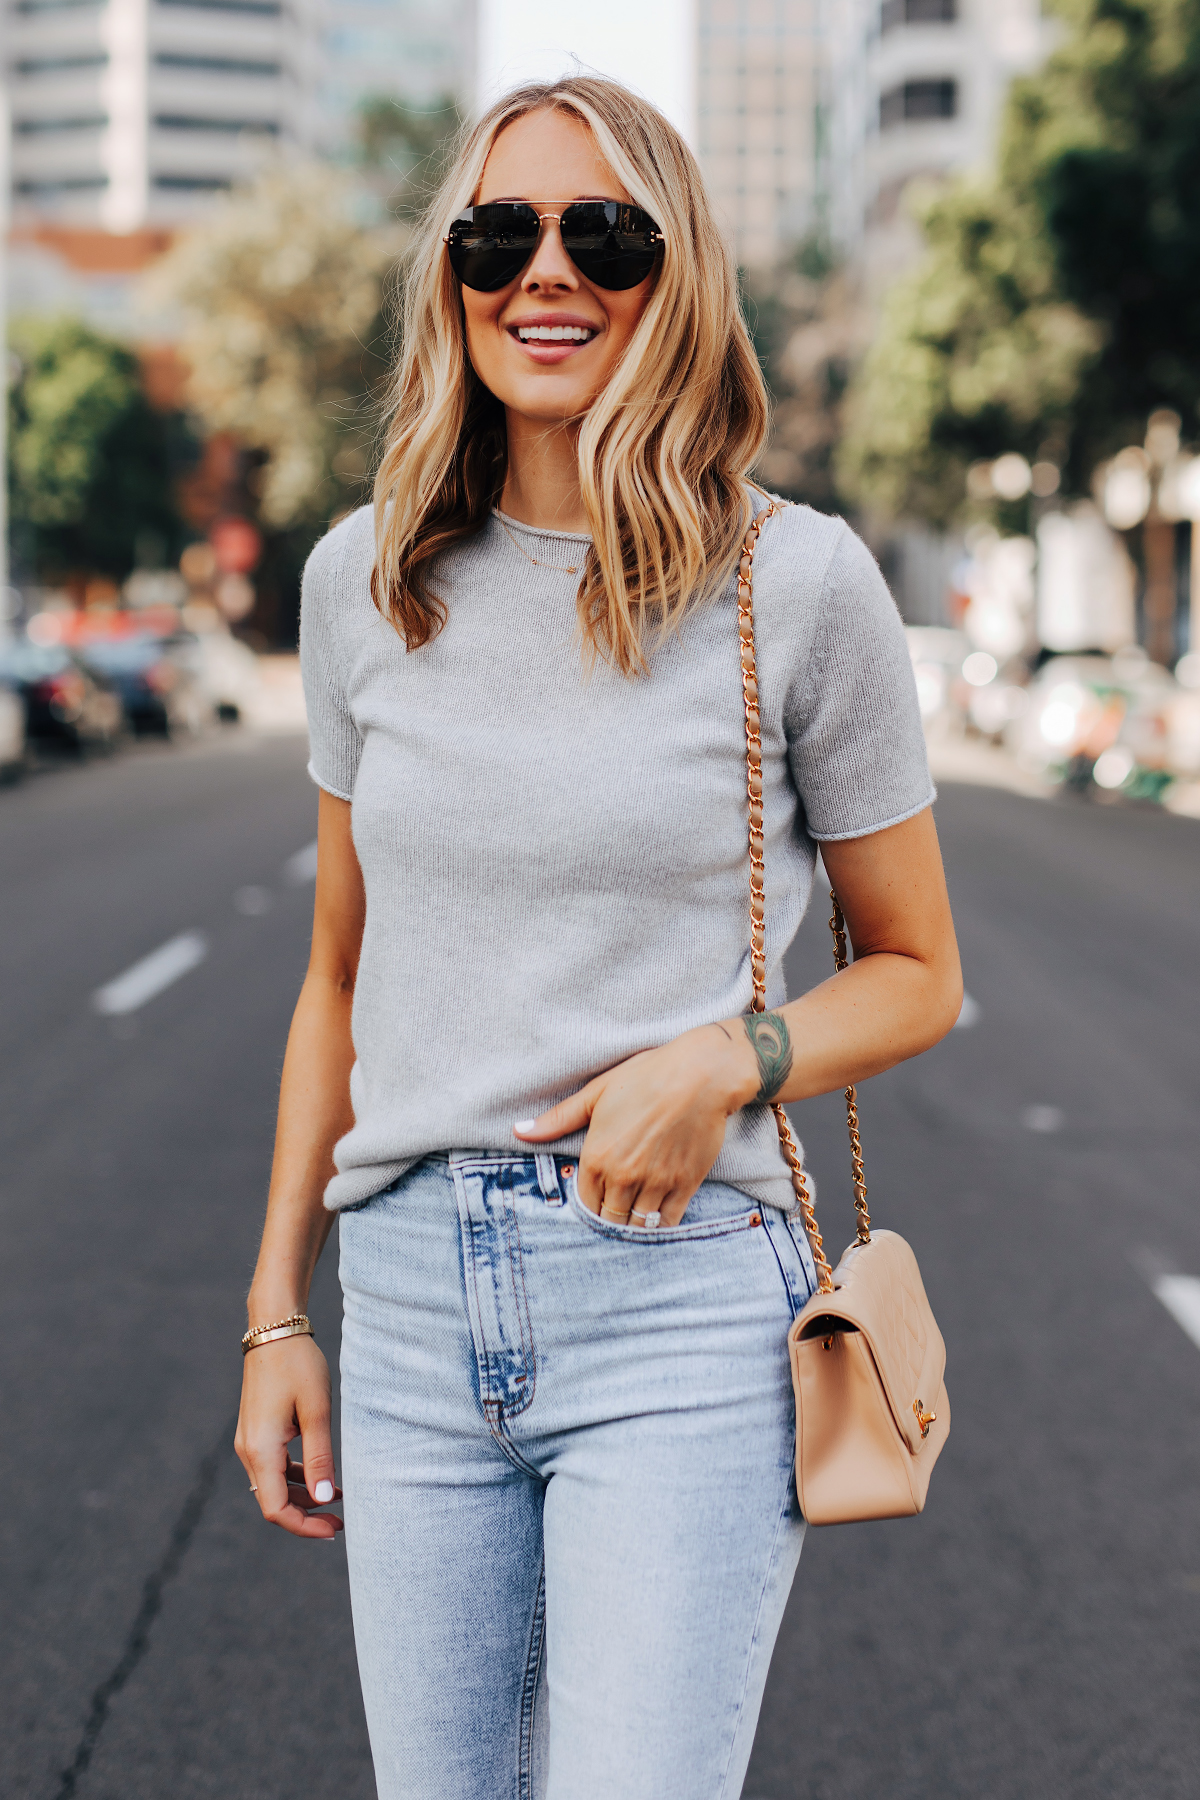 Fashion Jackson Wearing Theory Tolleree Short Sleeve Sweater Grey Abercrombie Straight Leg Jeans Chanel Beige Handbag